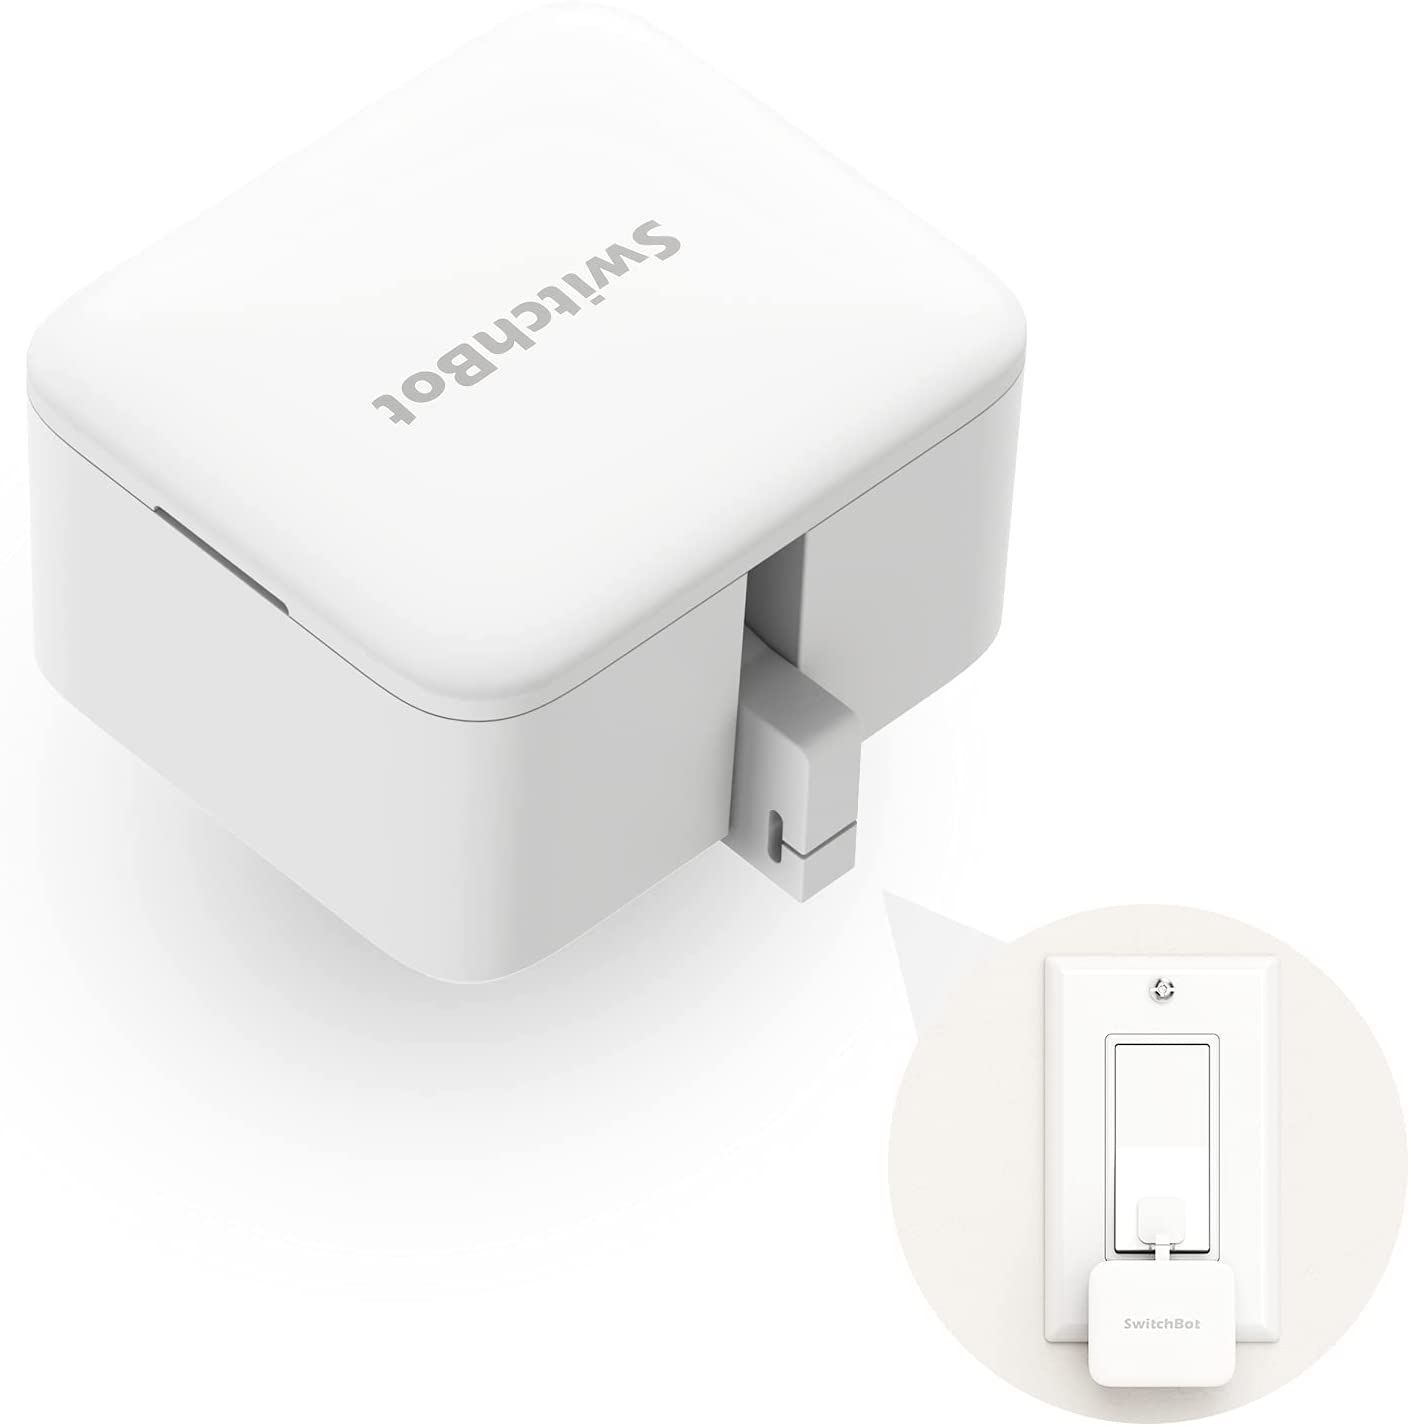 Interruptor inteligente wifi SwitchBot Wonderlabs